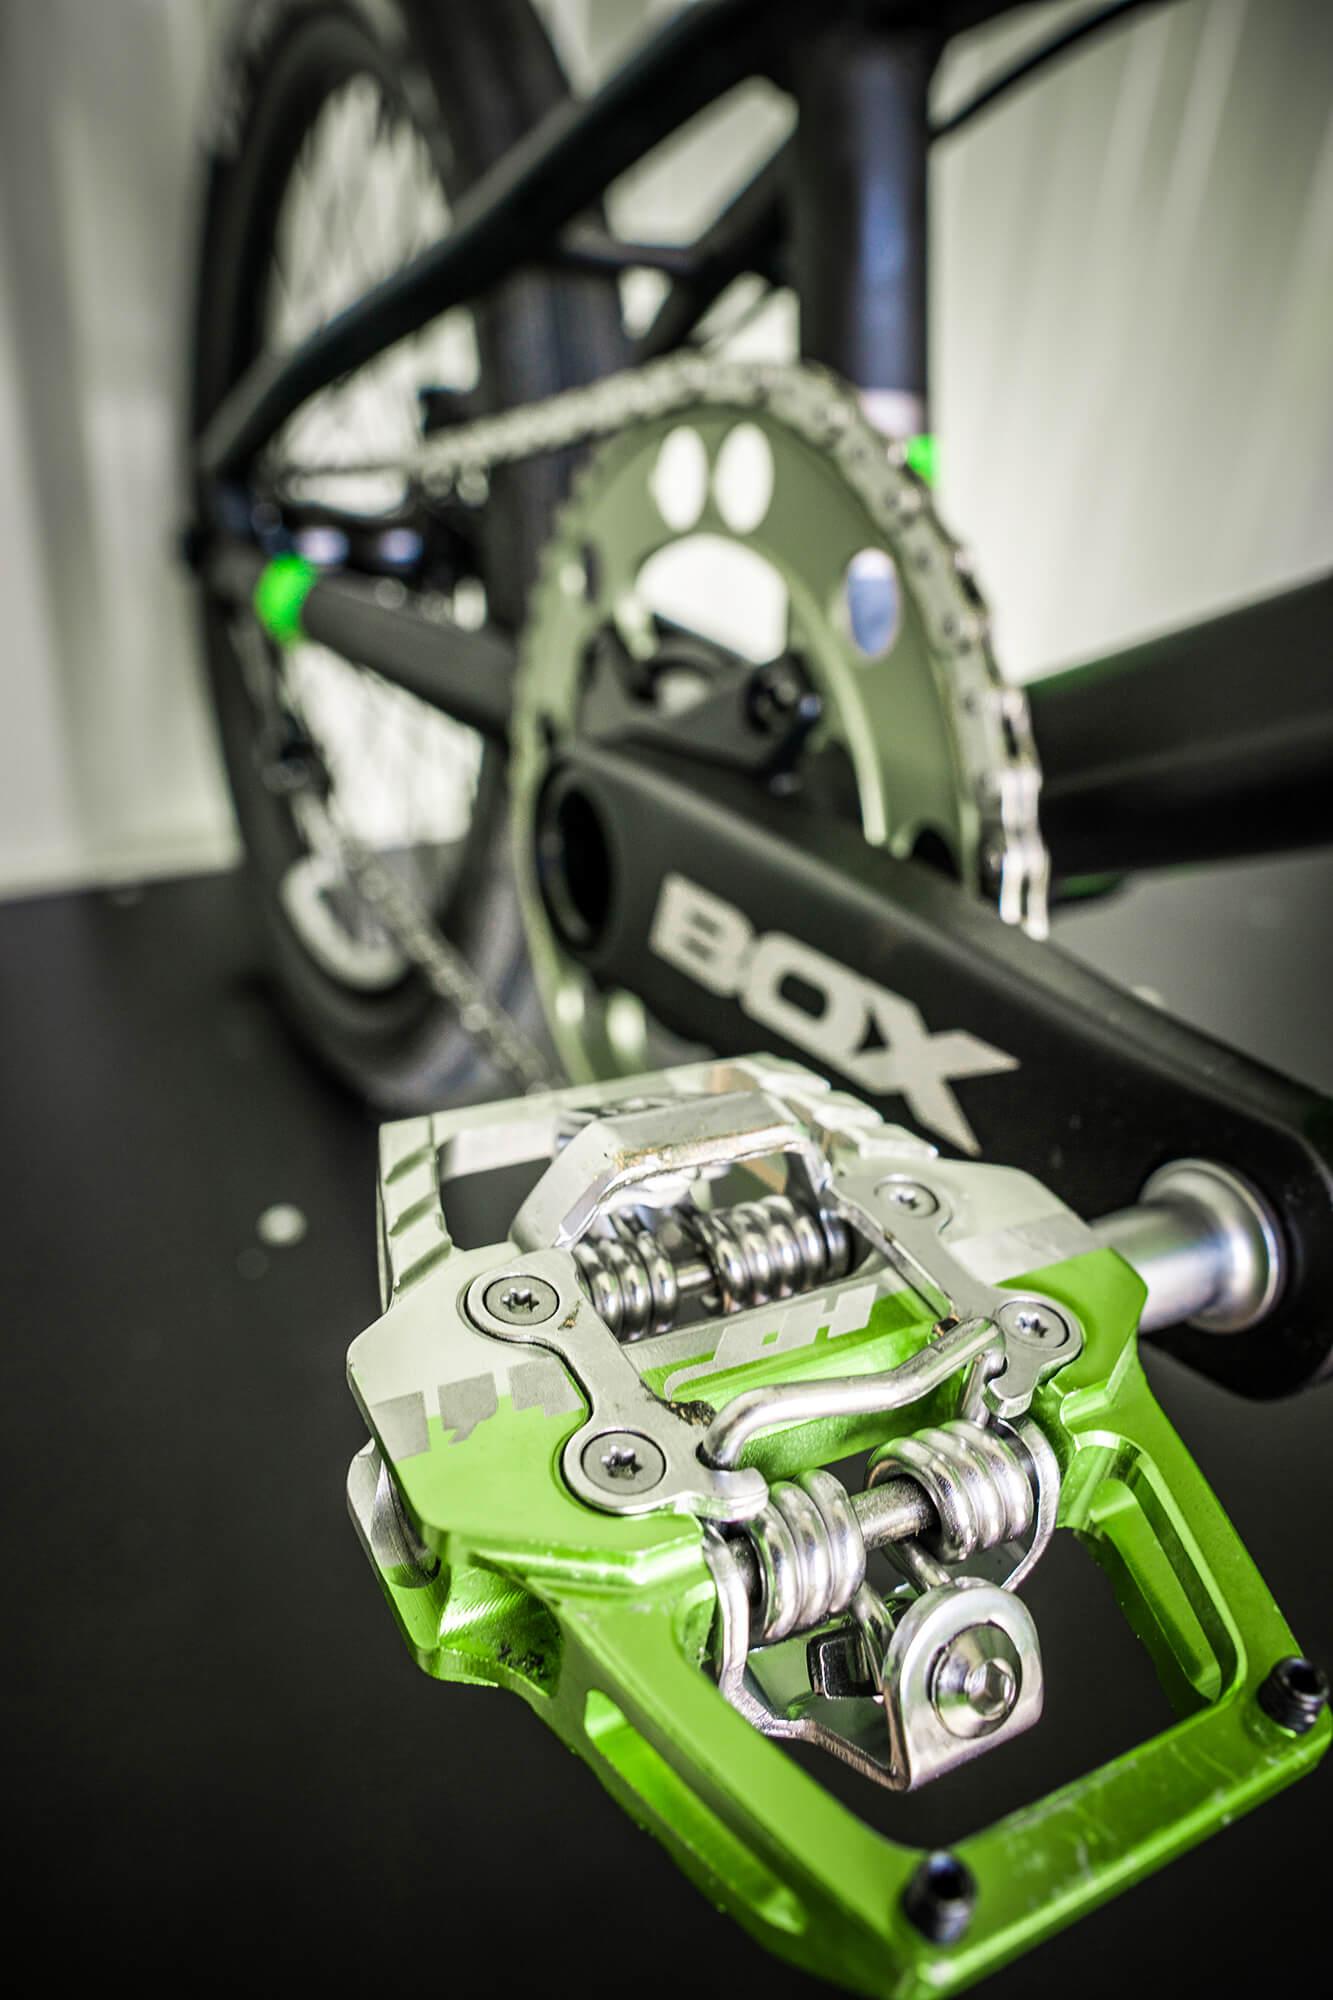 Team Oegema TVE Bike Check 2020 - DSC02186 - Niel Bensink